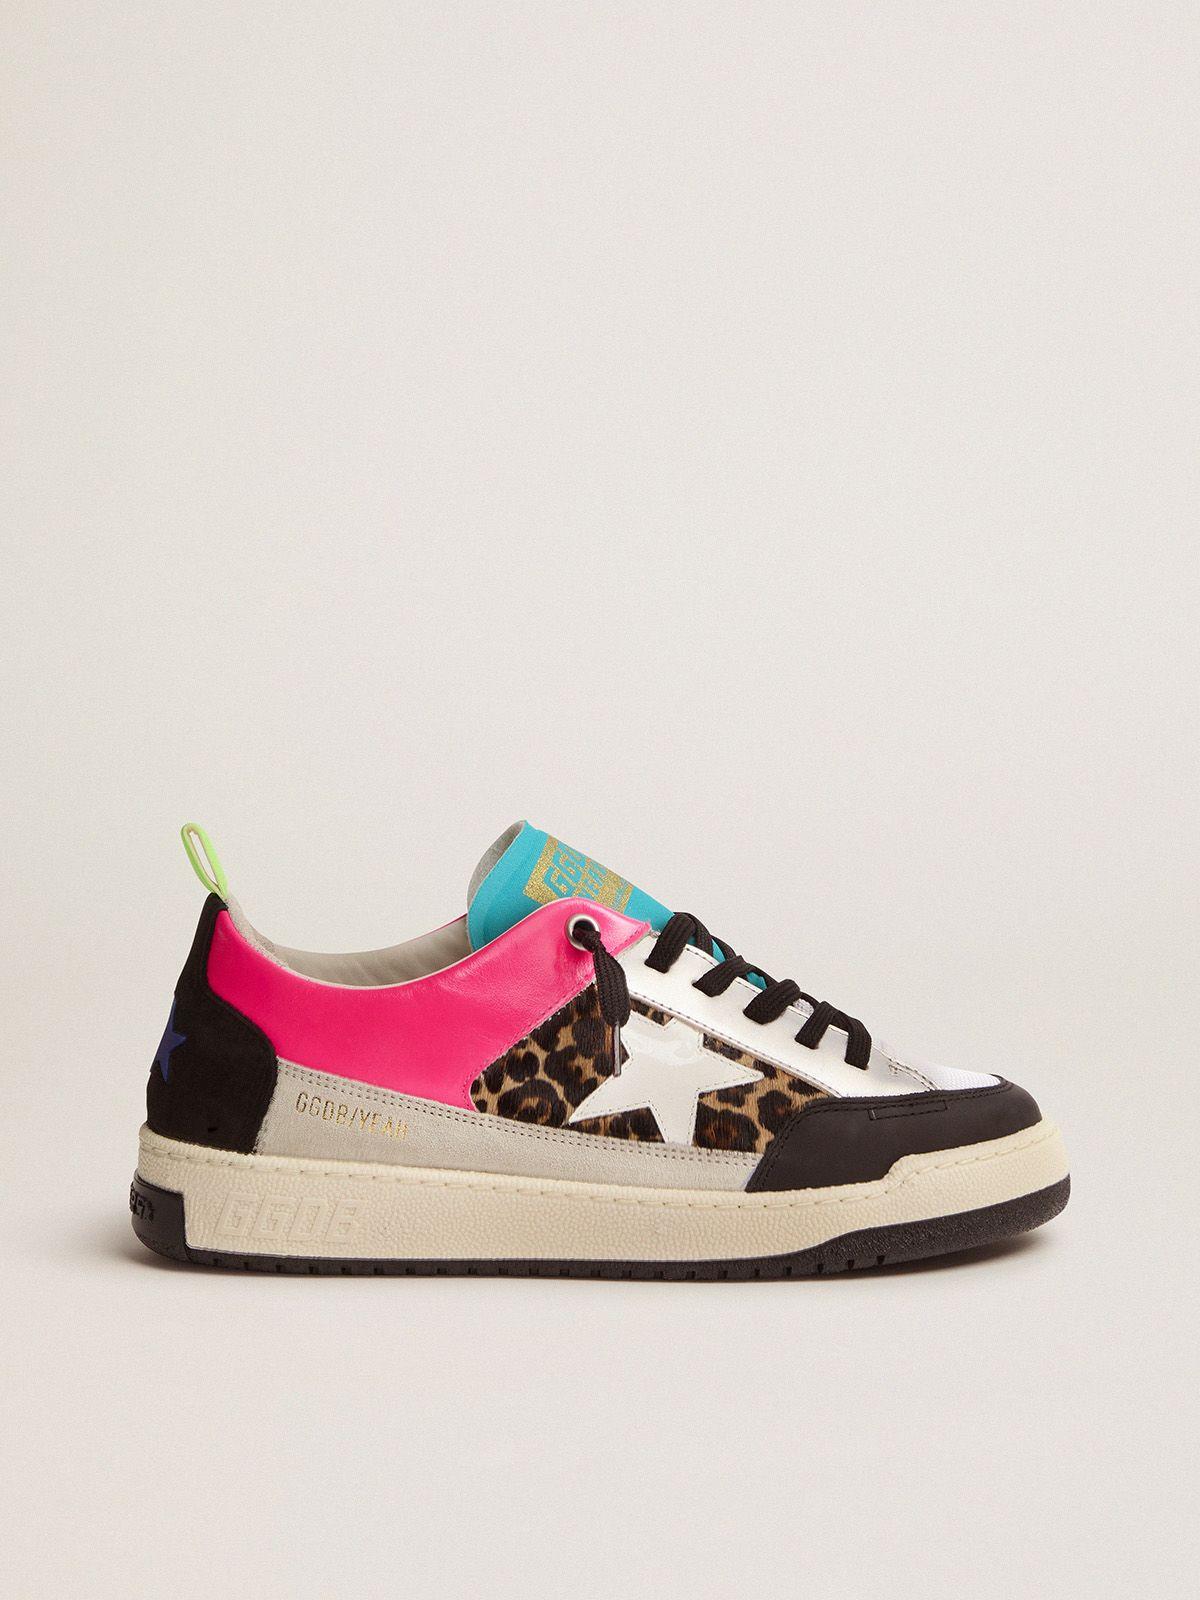 Women's fuchsia and leopard-print Yeah sneakers